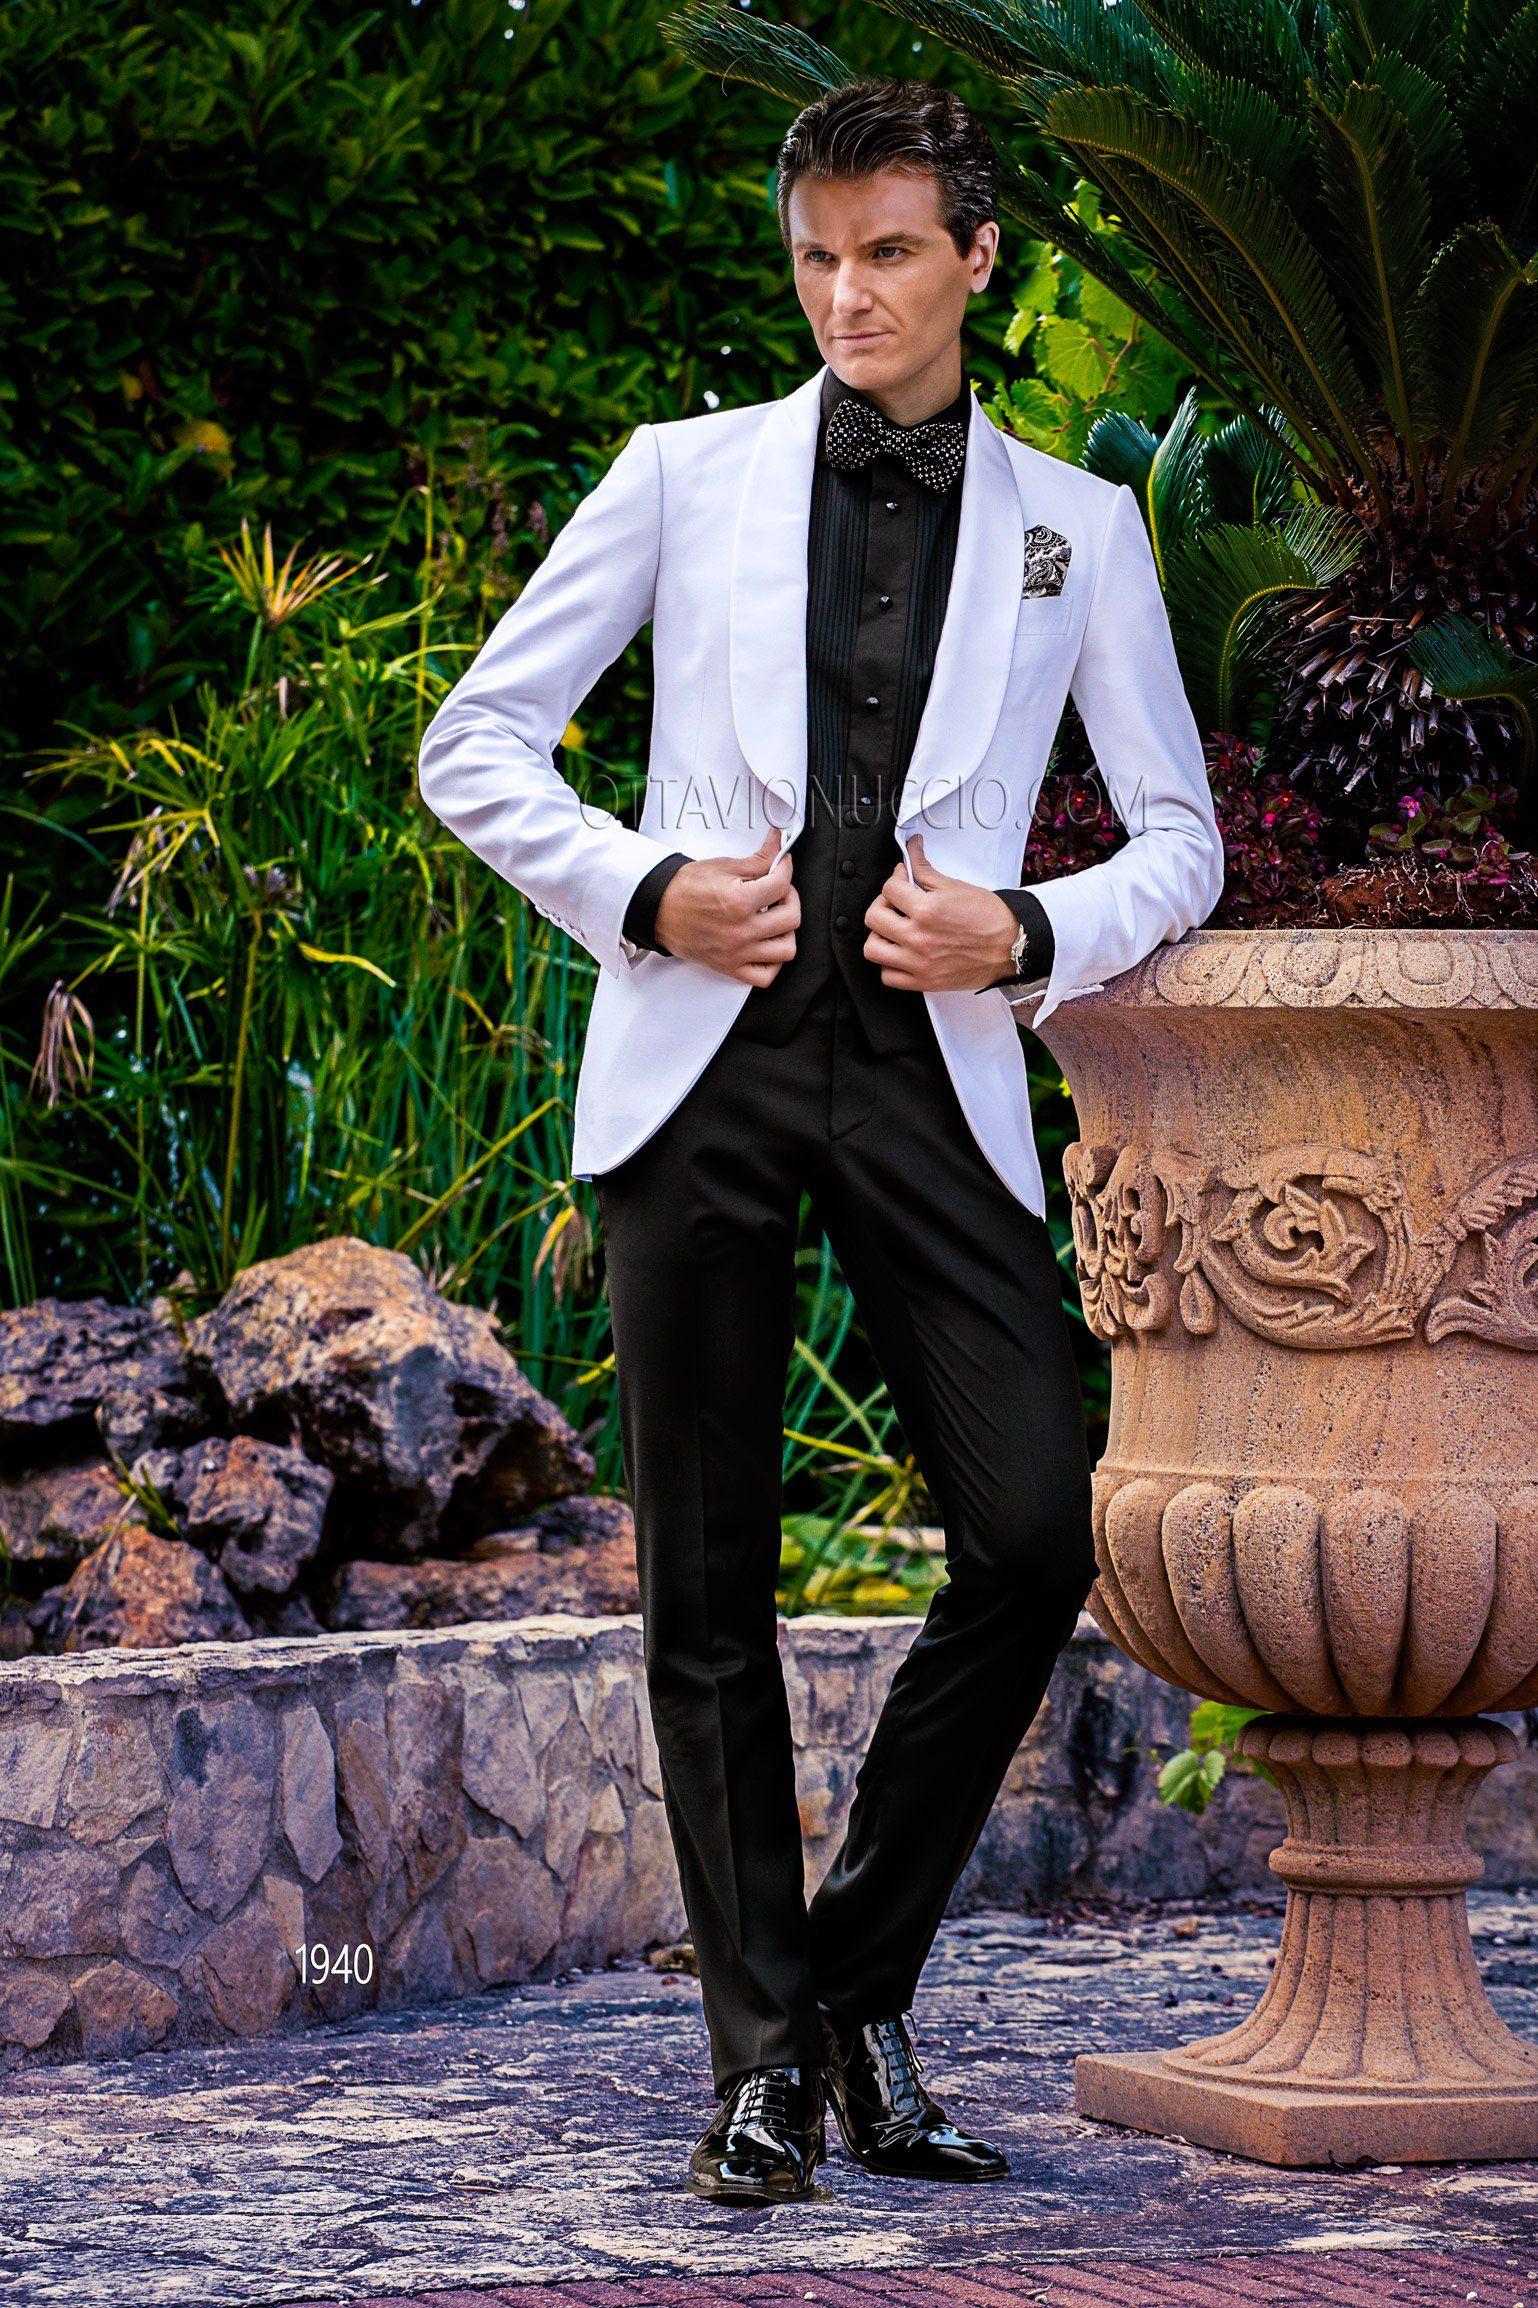 White And Black Italian Wedding Tuxedo Groom Suit Luxury Menswear Dapper